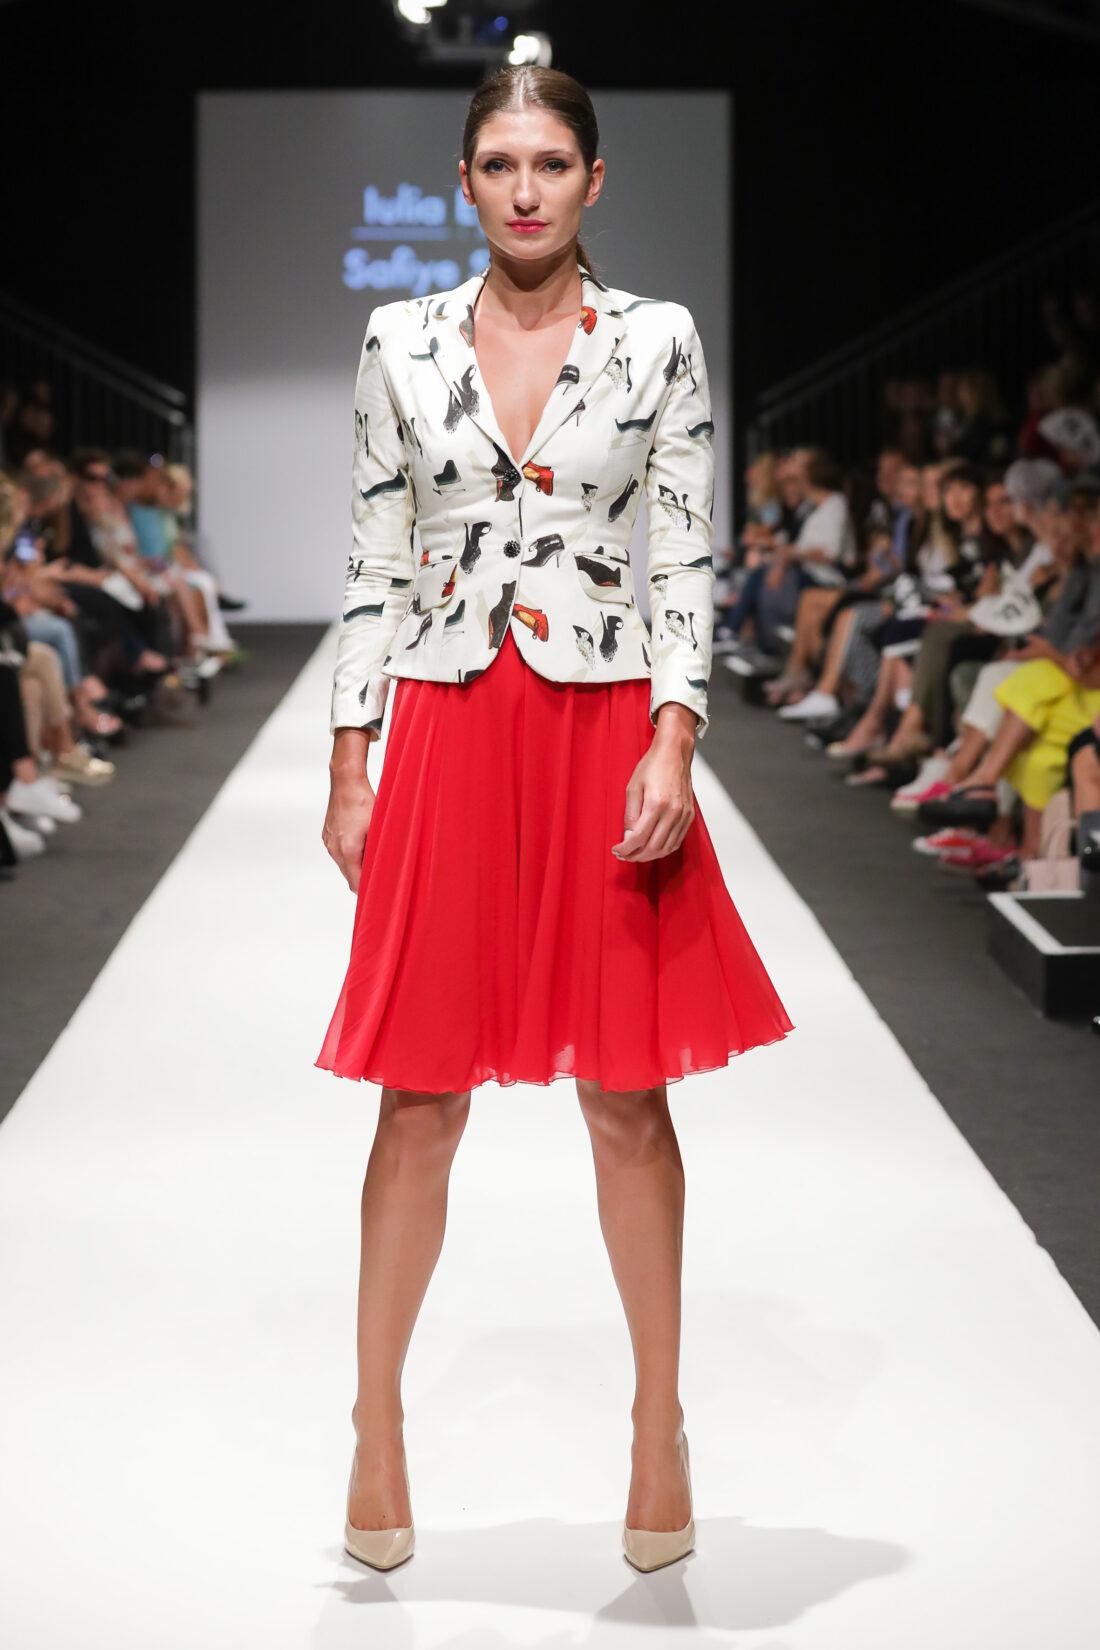 Modeakademie Sitam MQVFW.21 ©Thomas Lerch